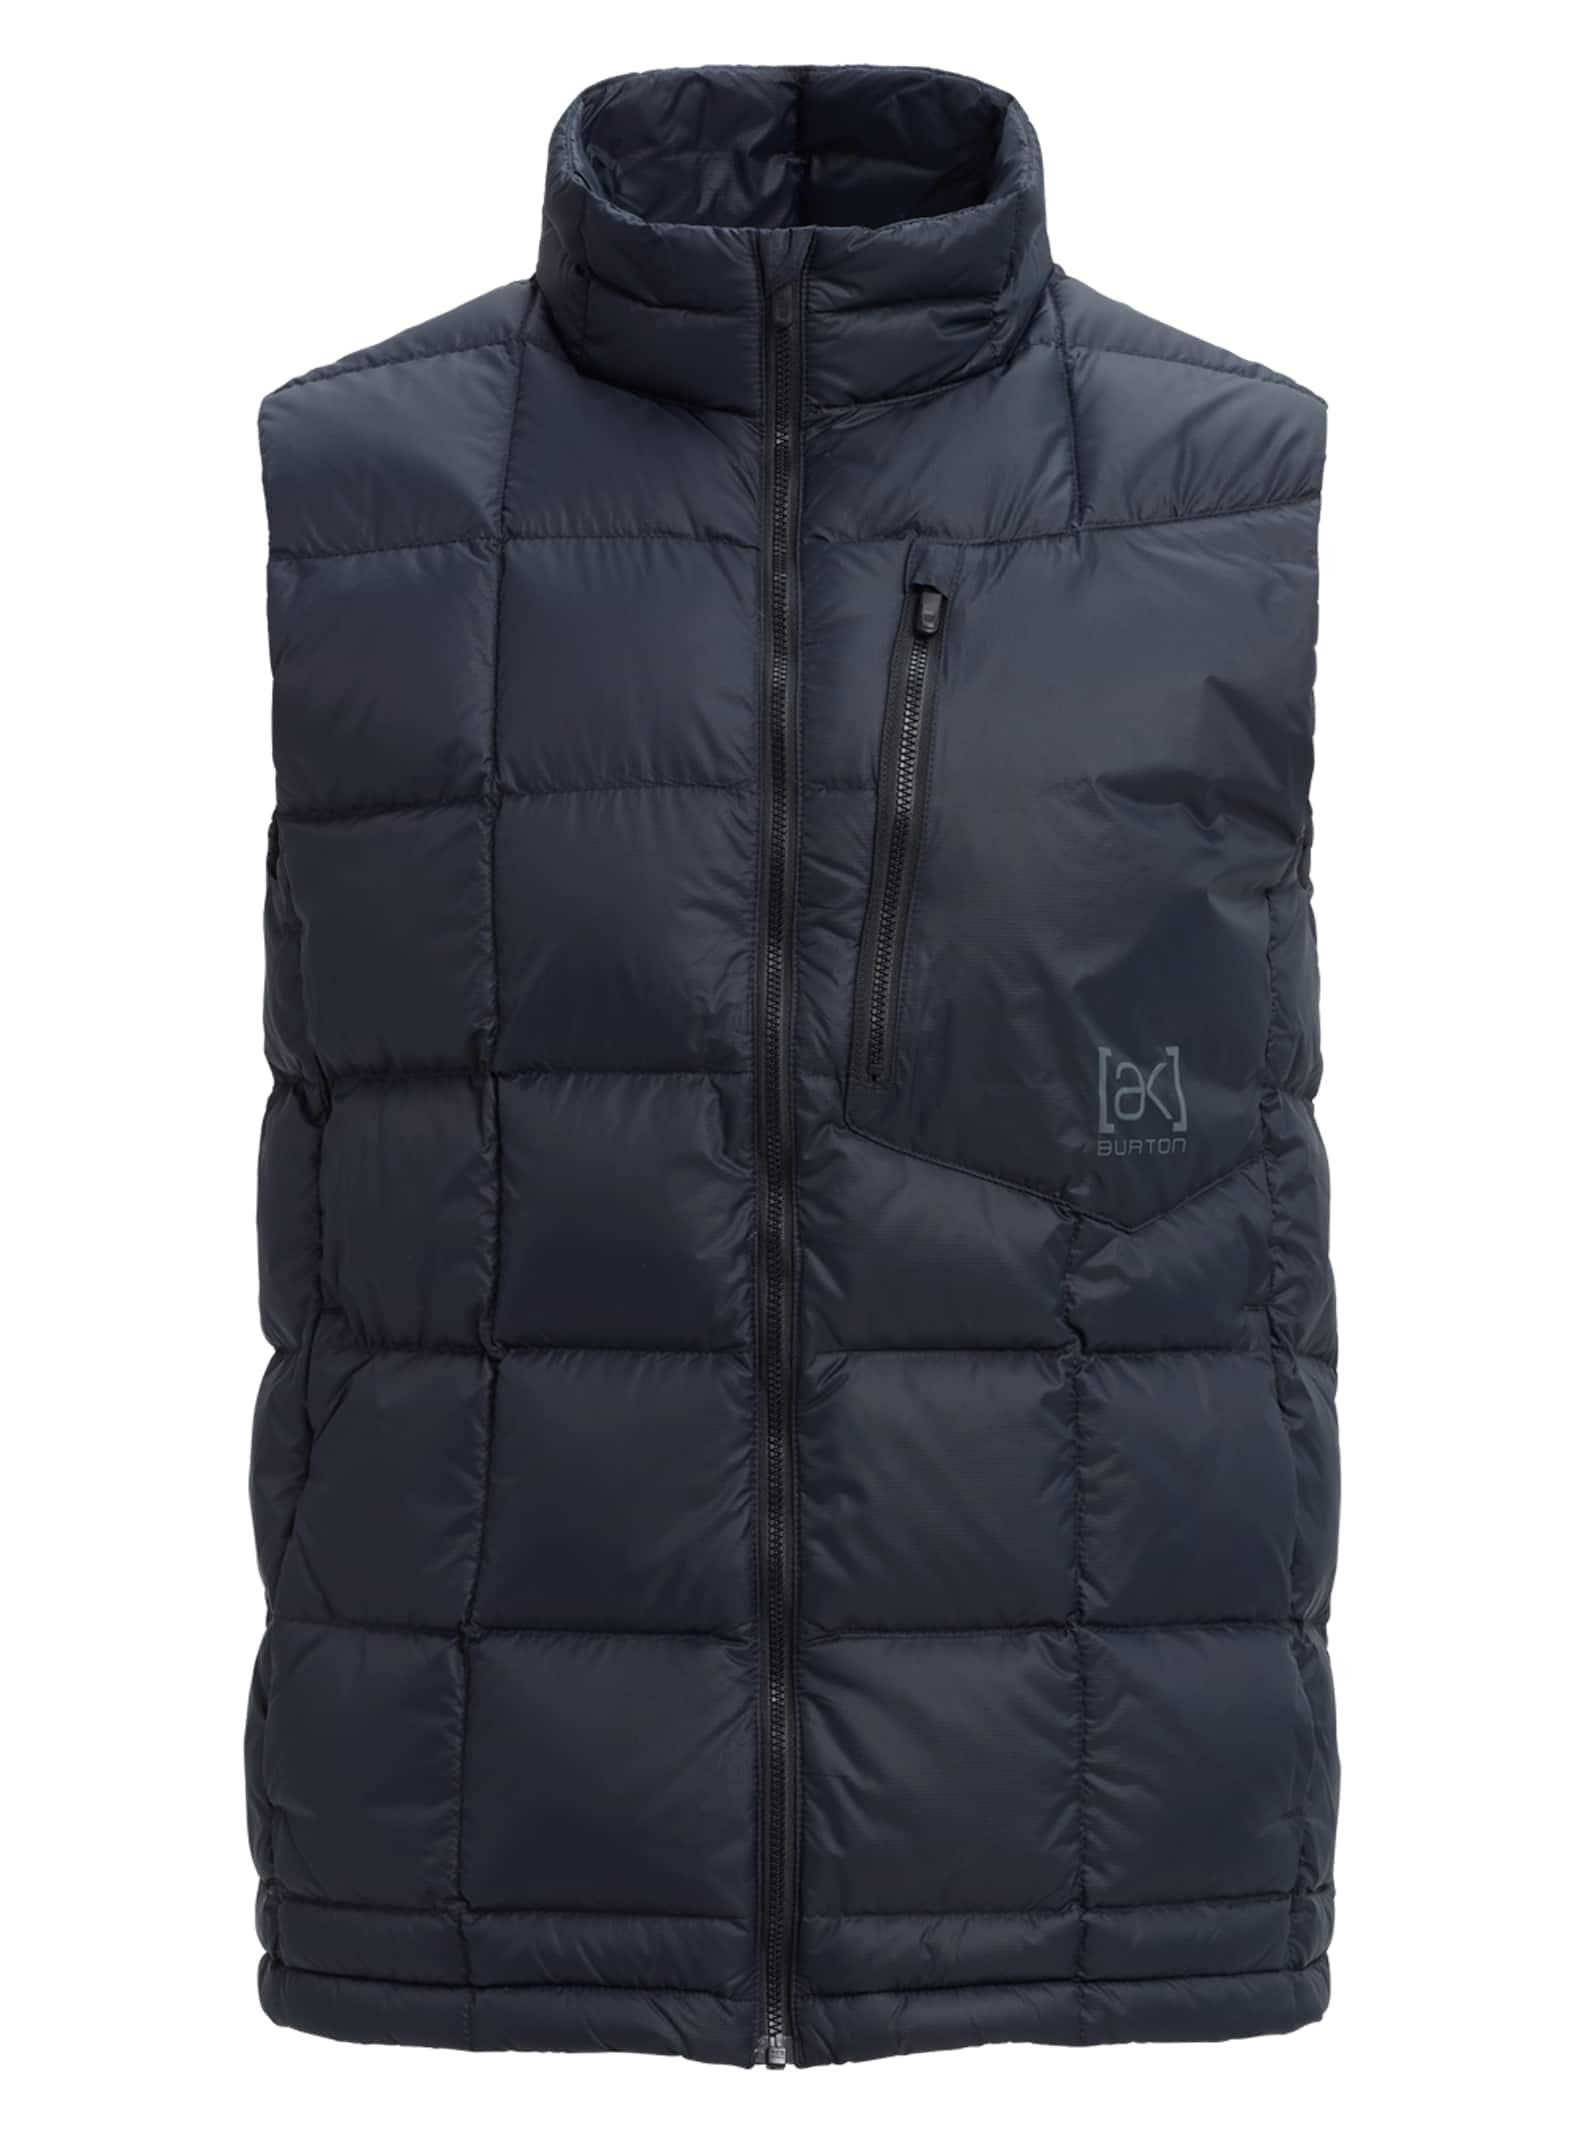 5f17961b6843e Men's and Women's [ak] Outerwear | Burton Snowboards